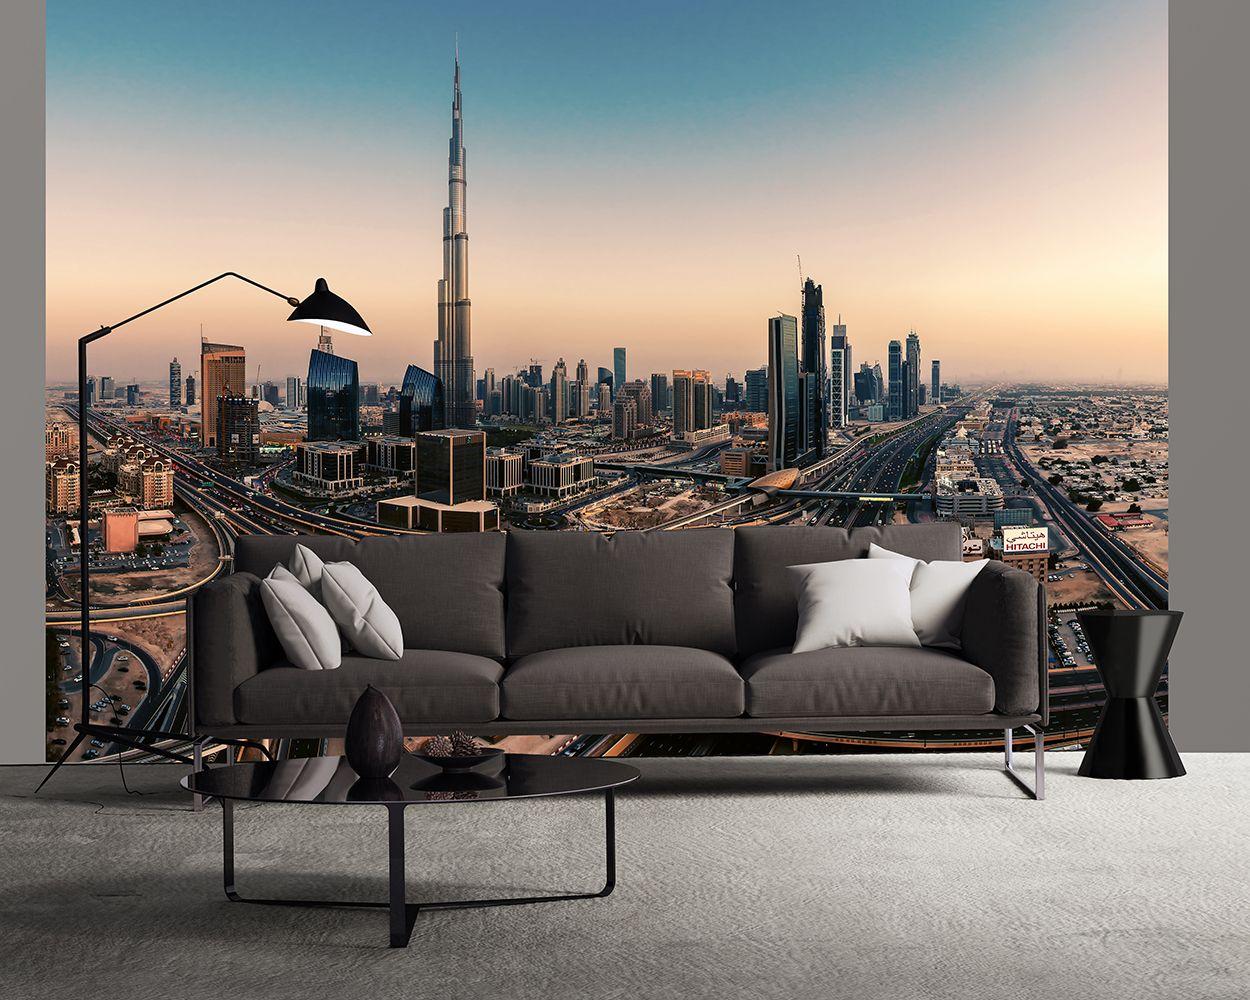 Photo wallpapers Dubai United Arab Emirates Shop online 1250x1000